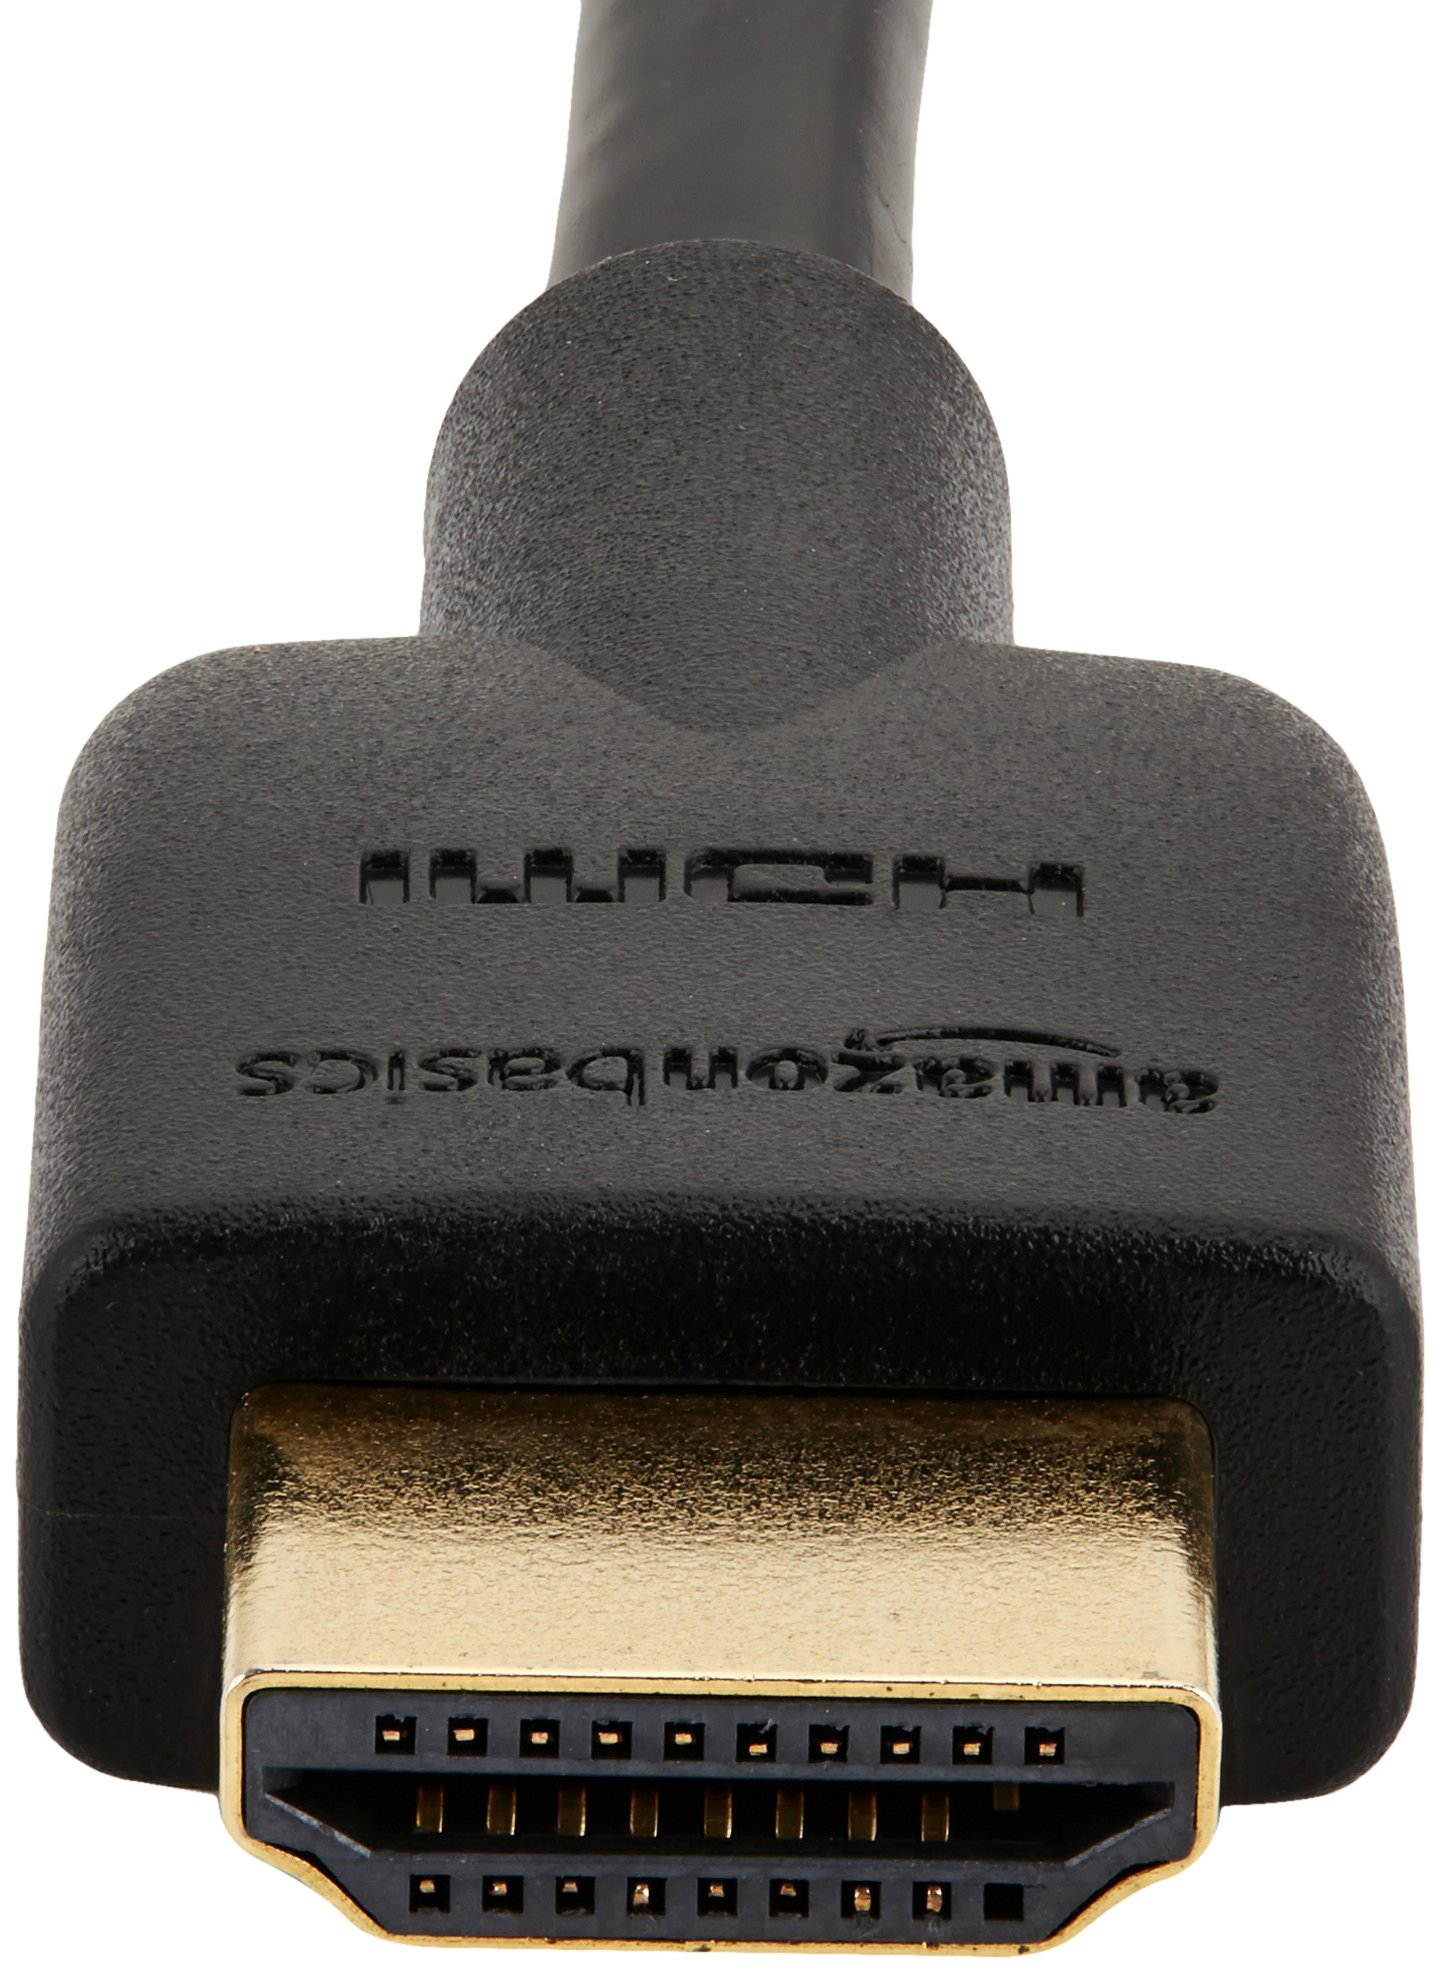 AmazonBasics High-Speed HDMI Cable - 6 Feet